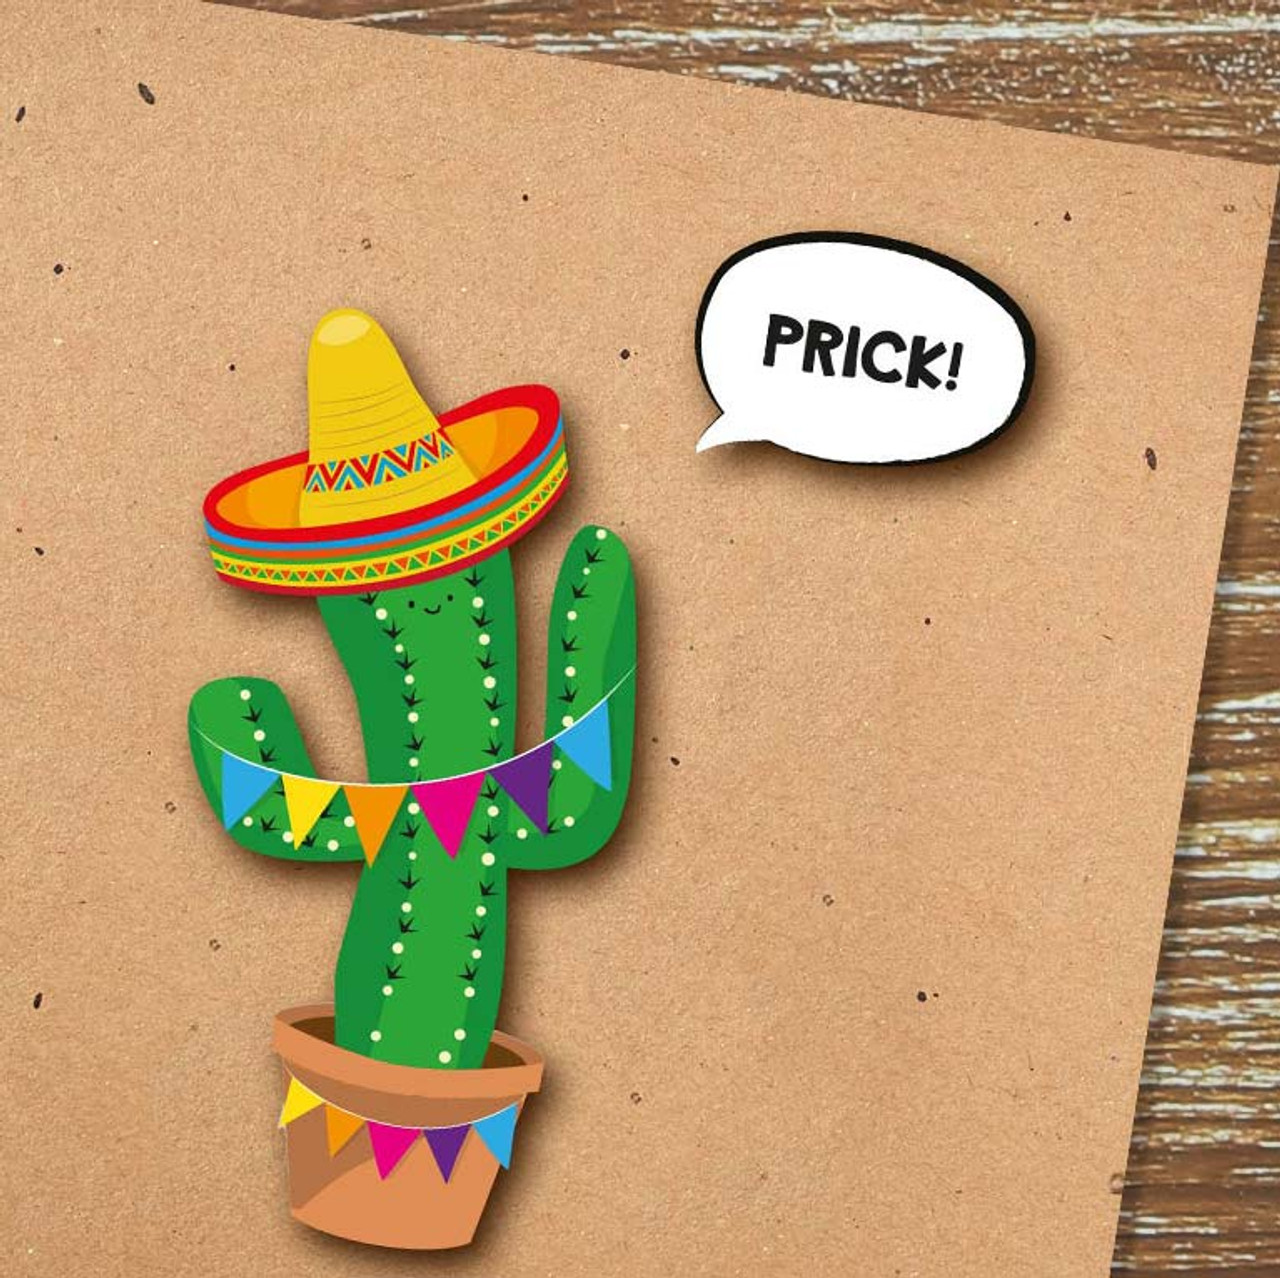 Funny Prick Pun Cactus Greeting Card